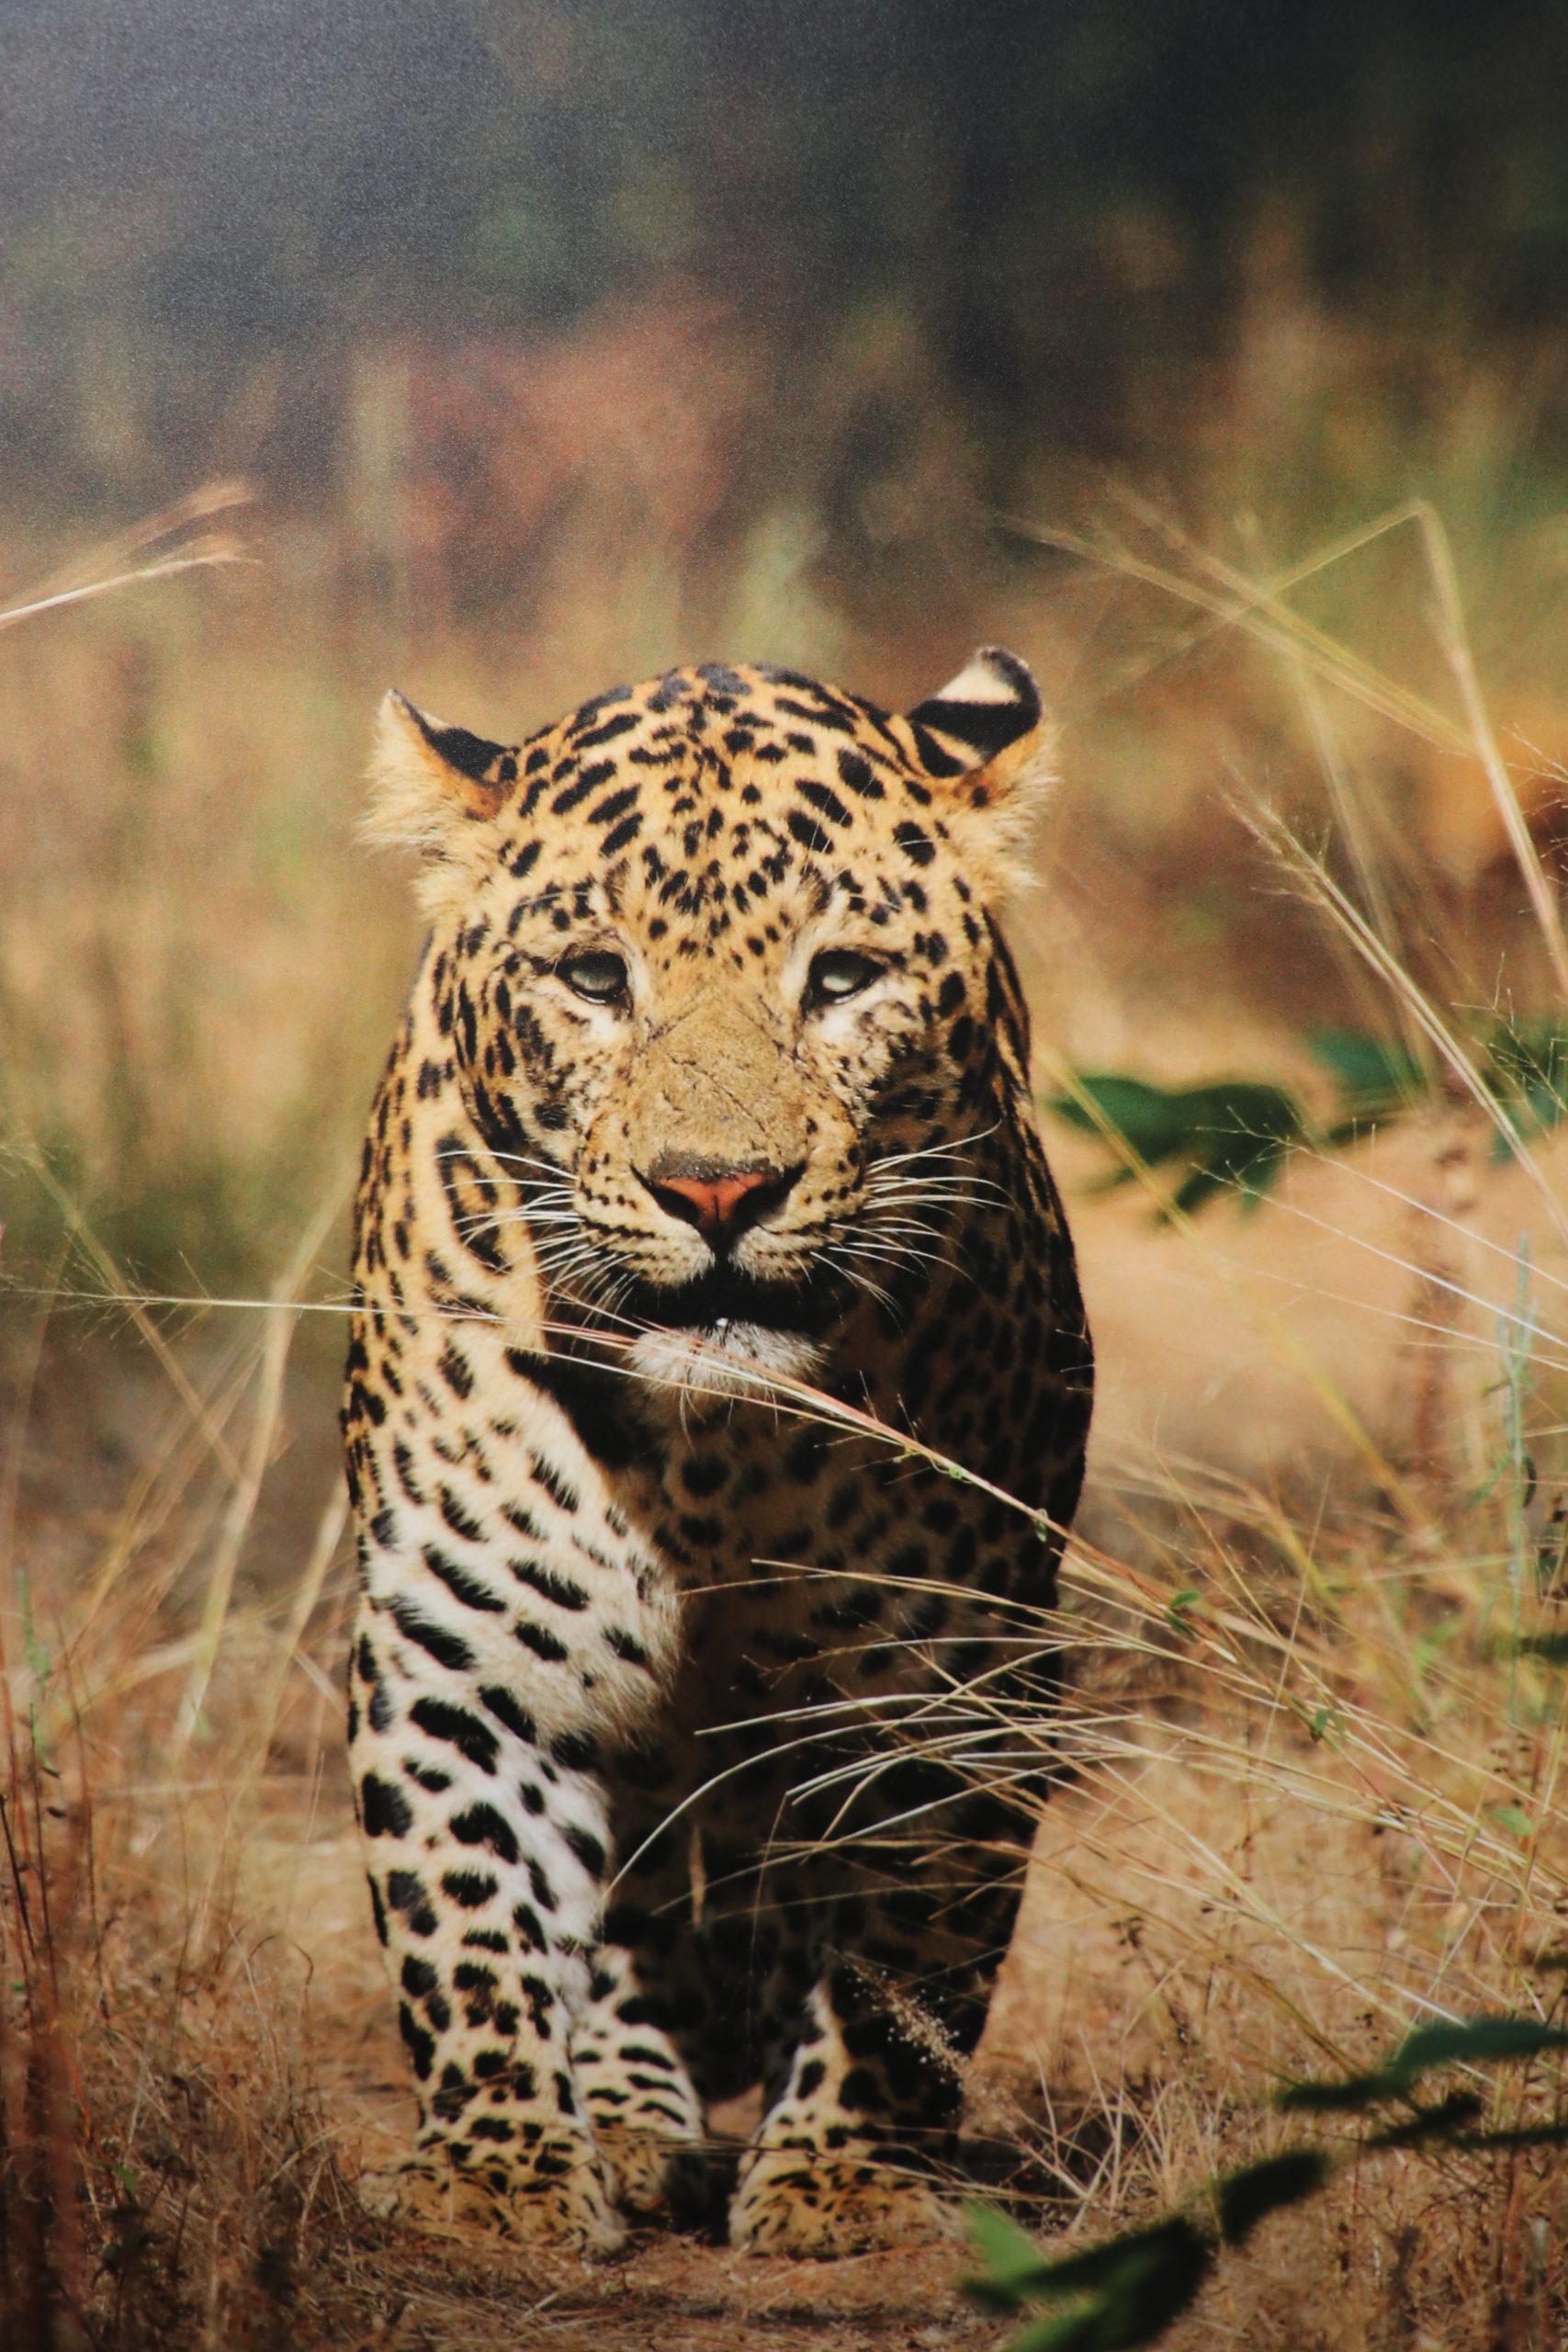 Tiger in the jungle.